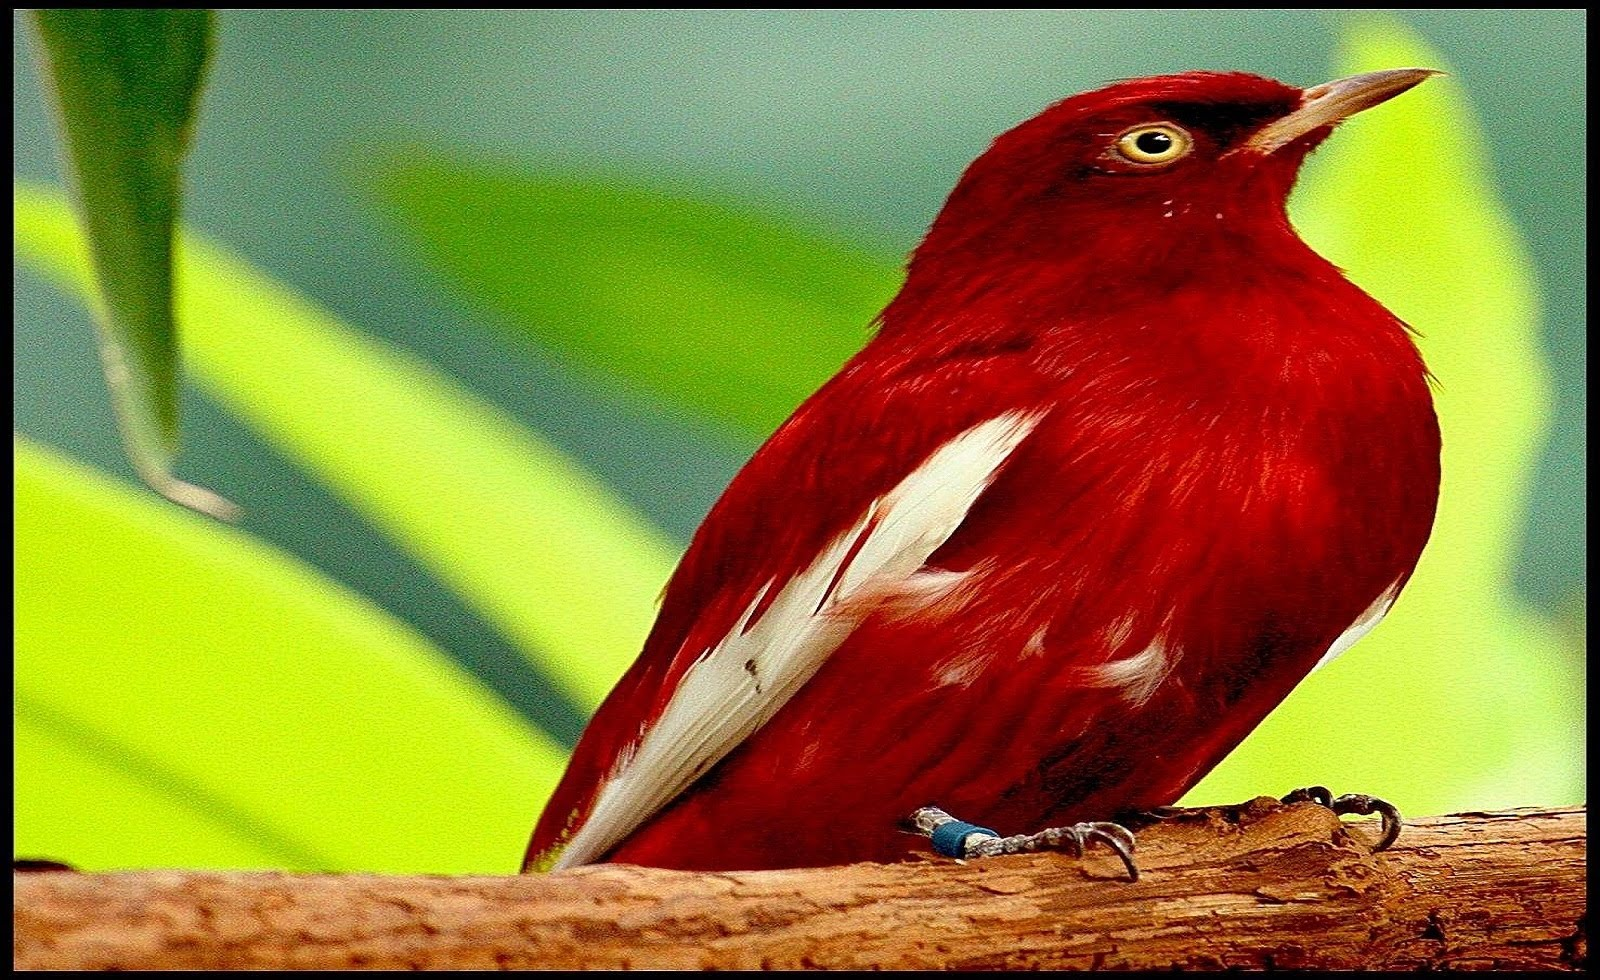 بالصور صور طيور , مجموعه صور طيور زينه رائعه 2404 4